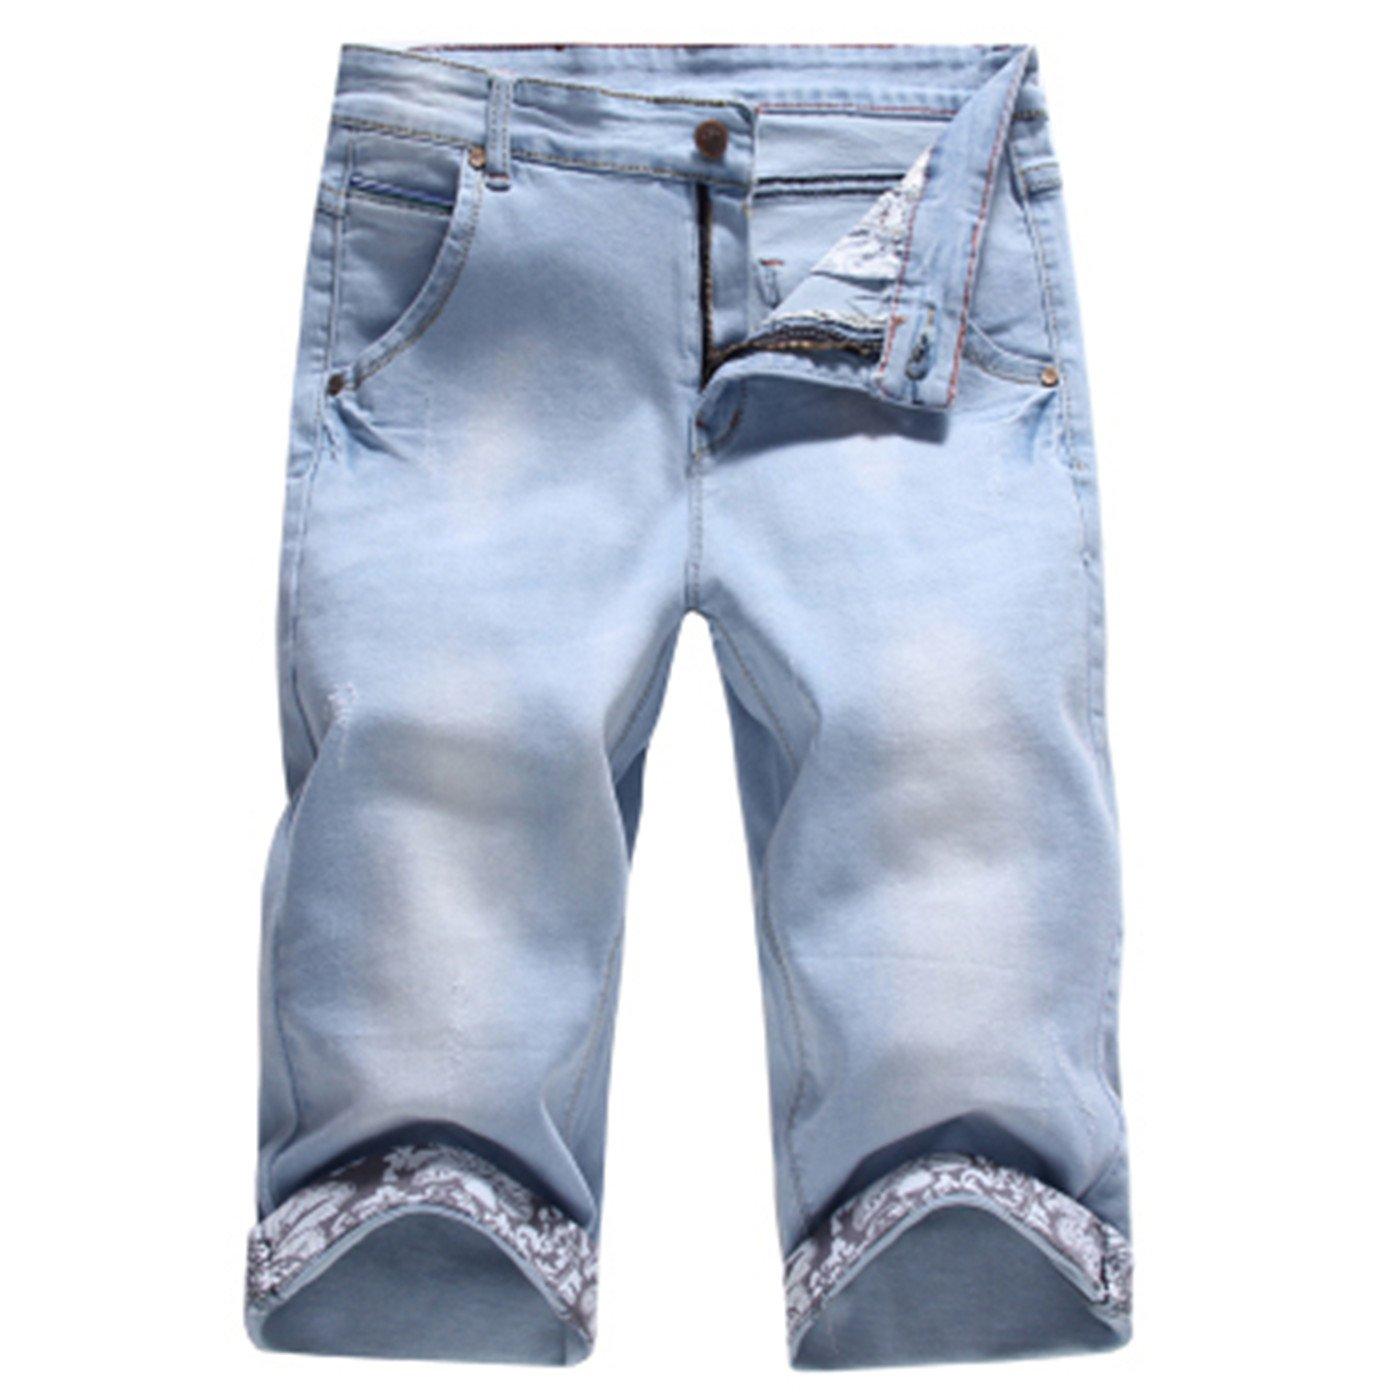 2018 Summer New Casual Solid Slim Cotton Shorts Men Jeans Blue Shorts Fashion Male Denim Clothing Pl